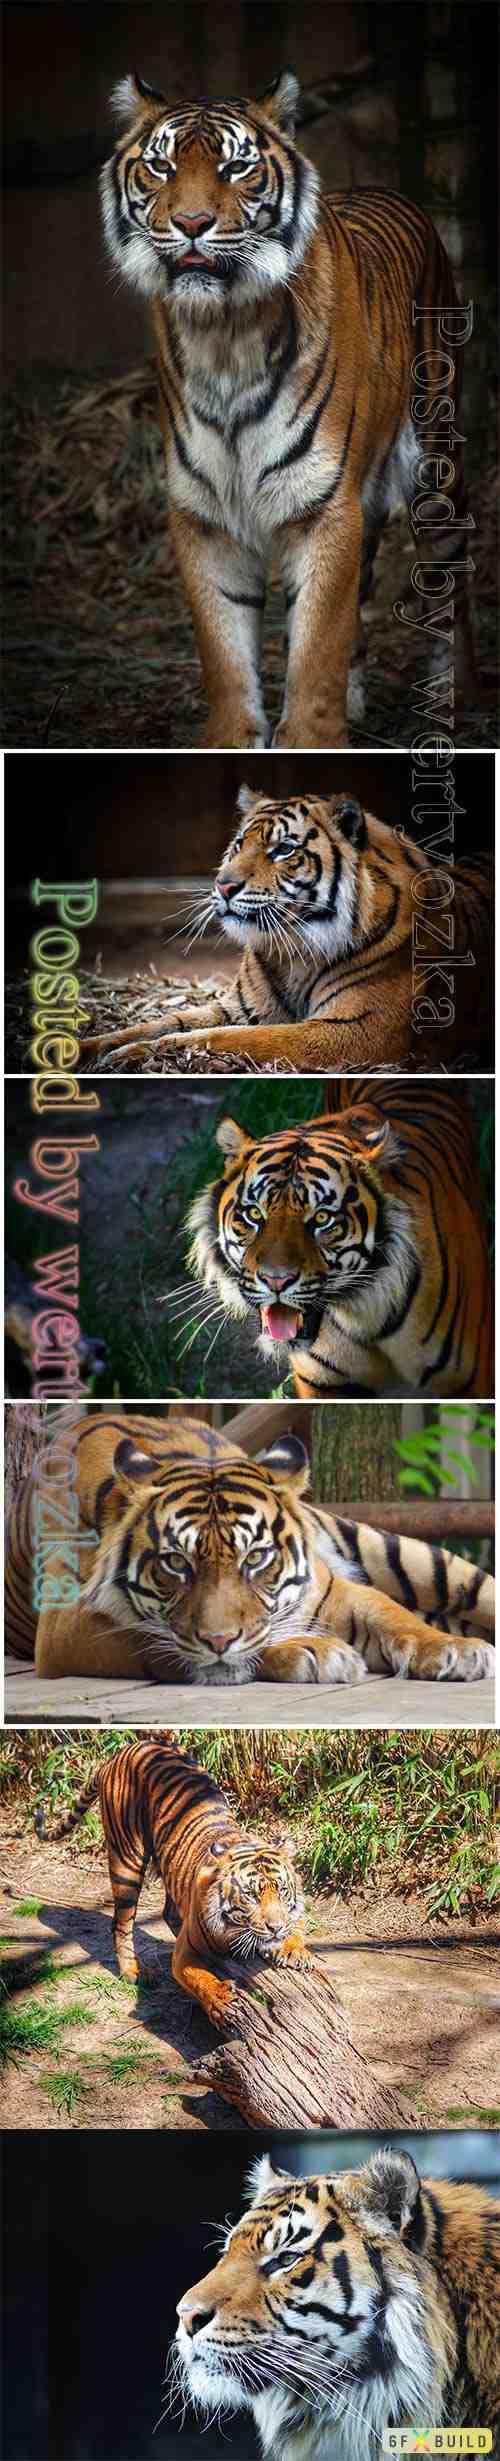 Tiger beautiful stock photo